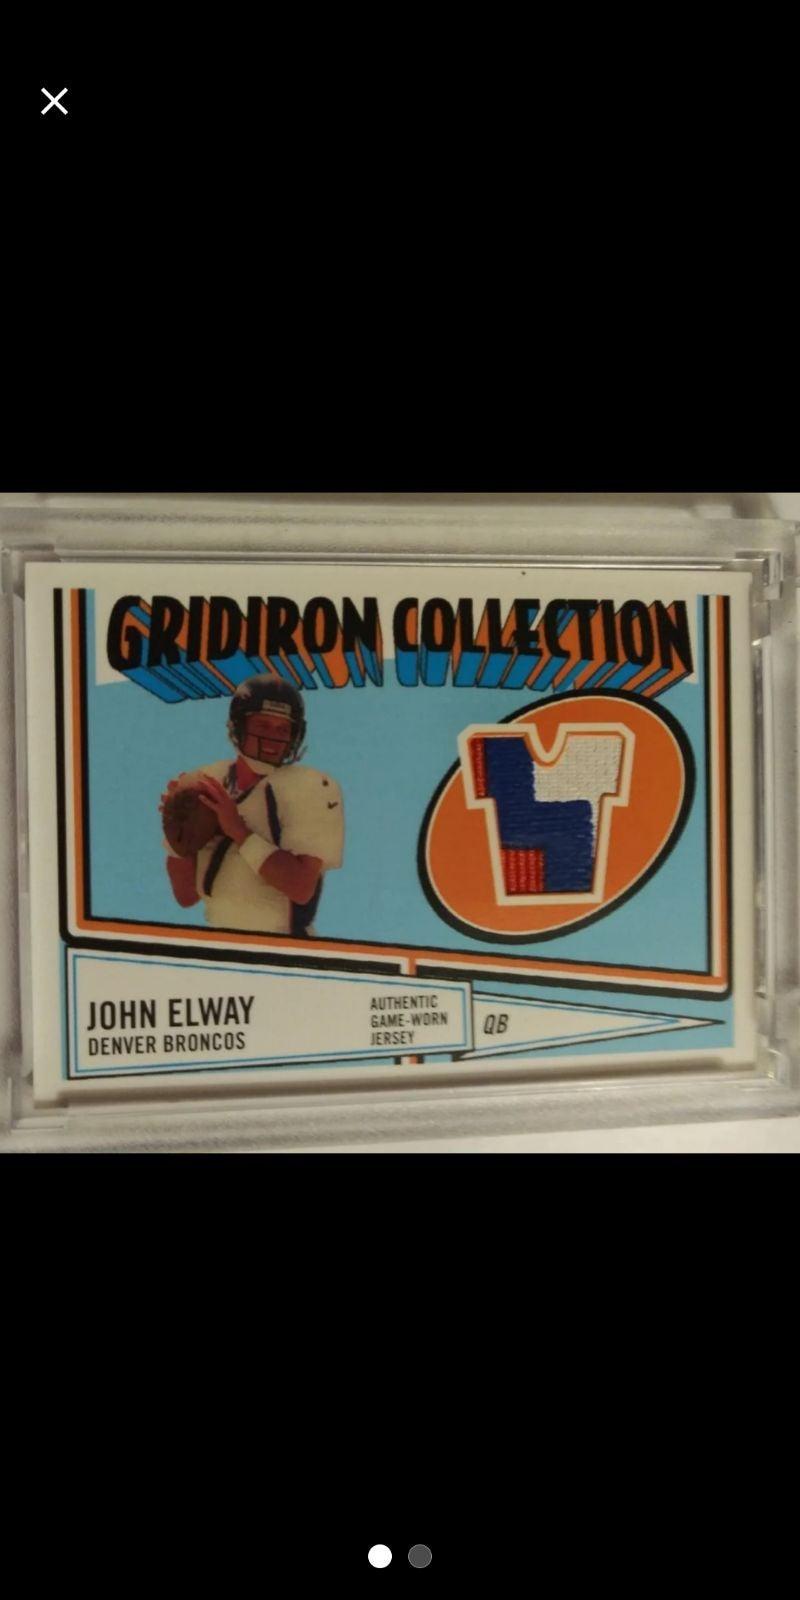 2005 John Elway 3 color game Jersey